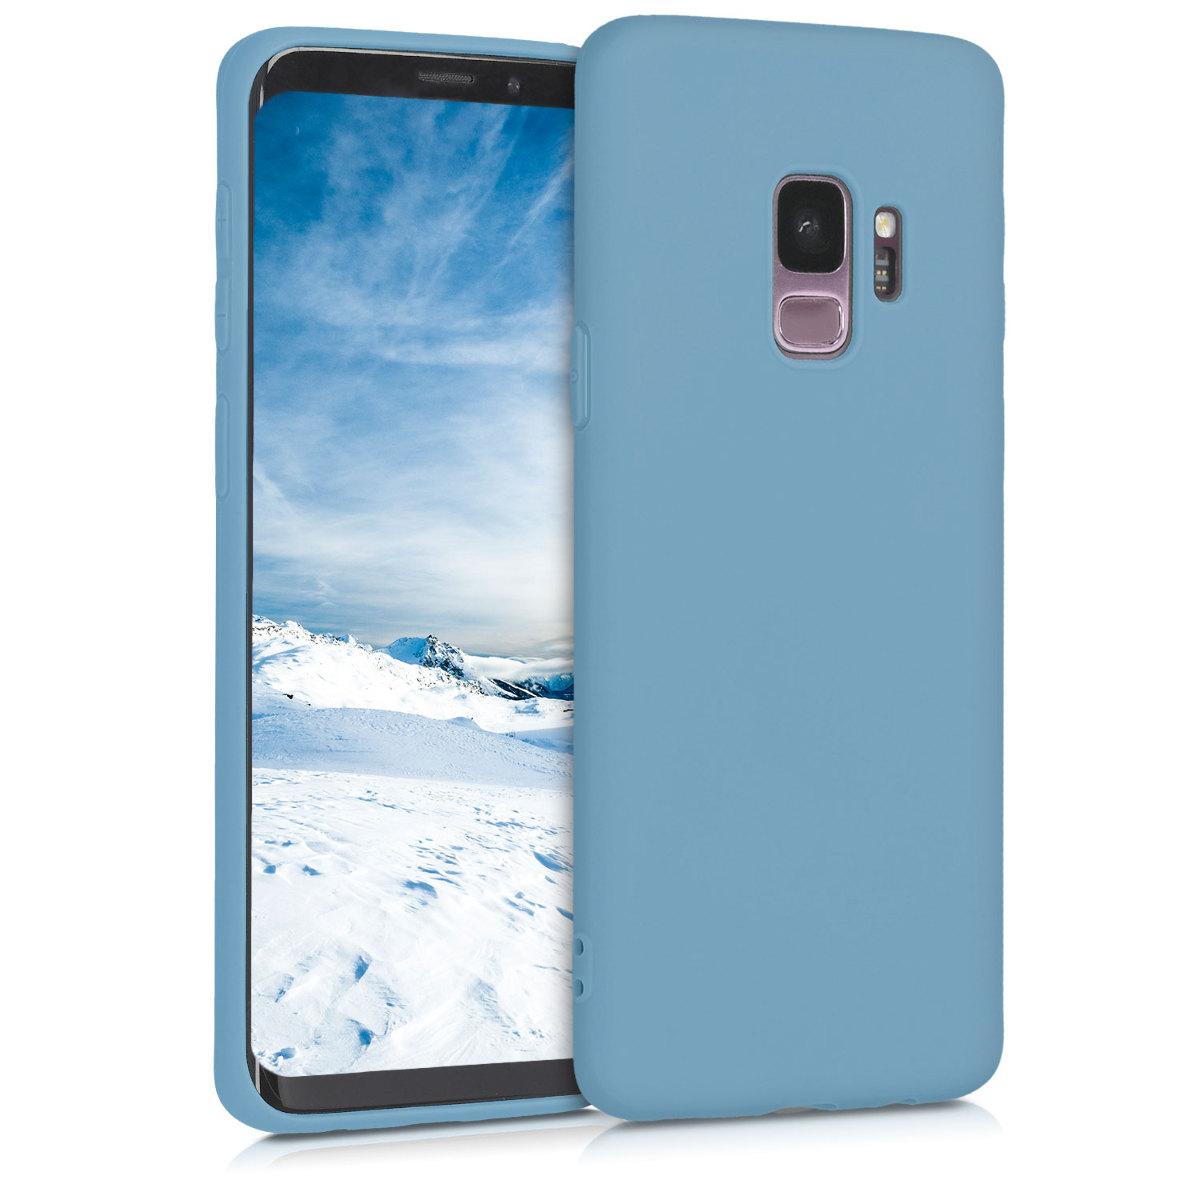 TPU Silikonové pouzdro pro Samsung Galaxy S9 - Soft Flexible Protective Phone Cover - Dove Blue